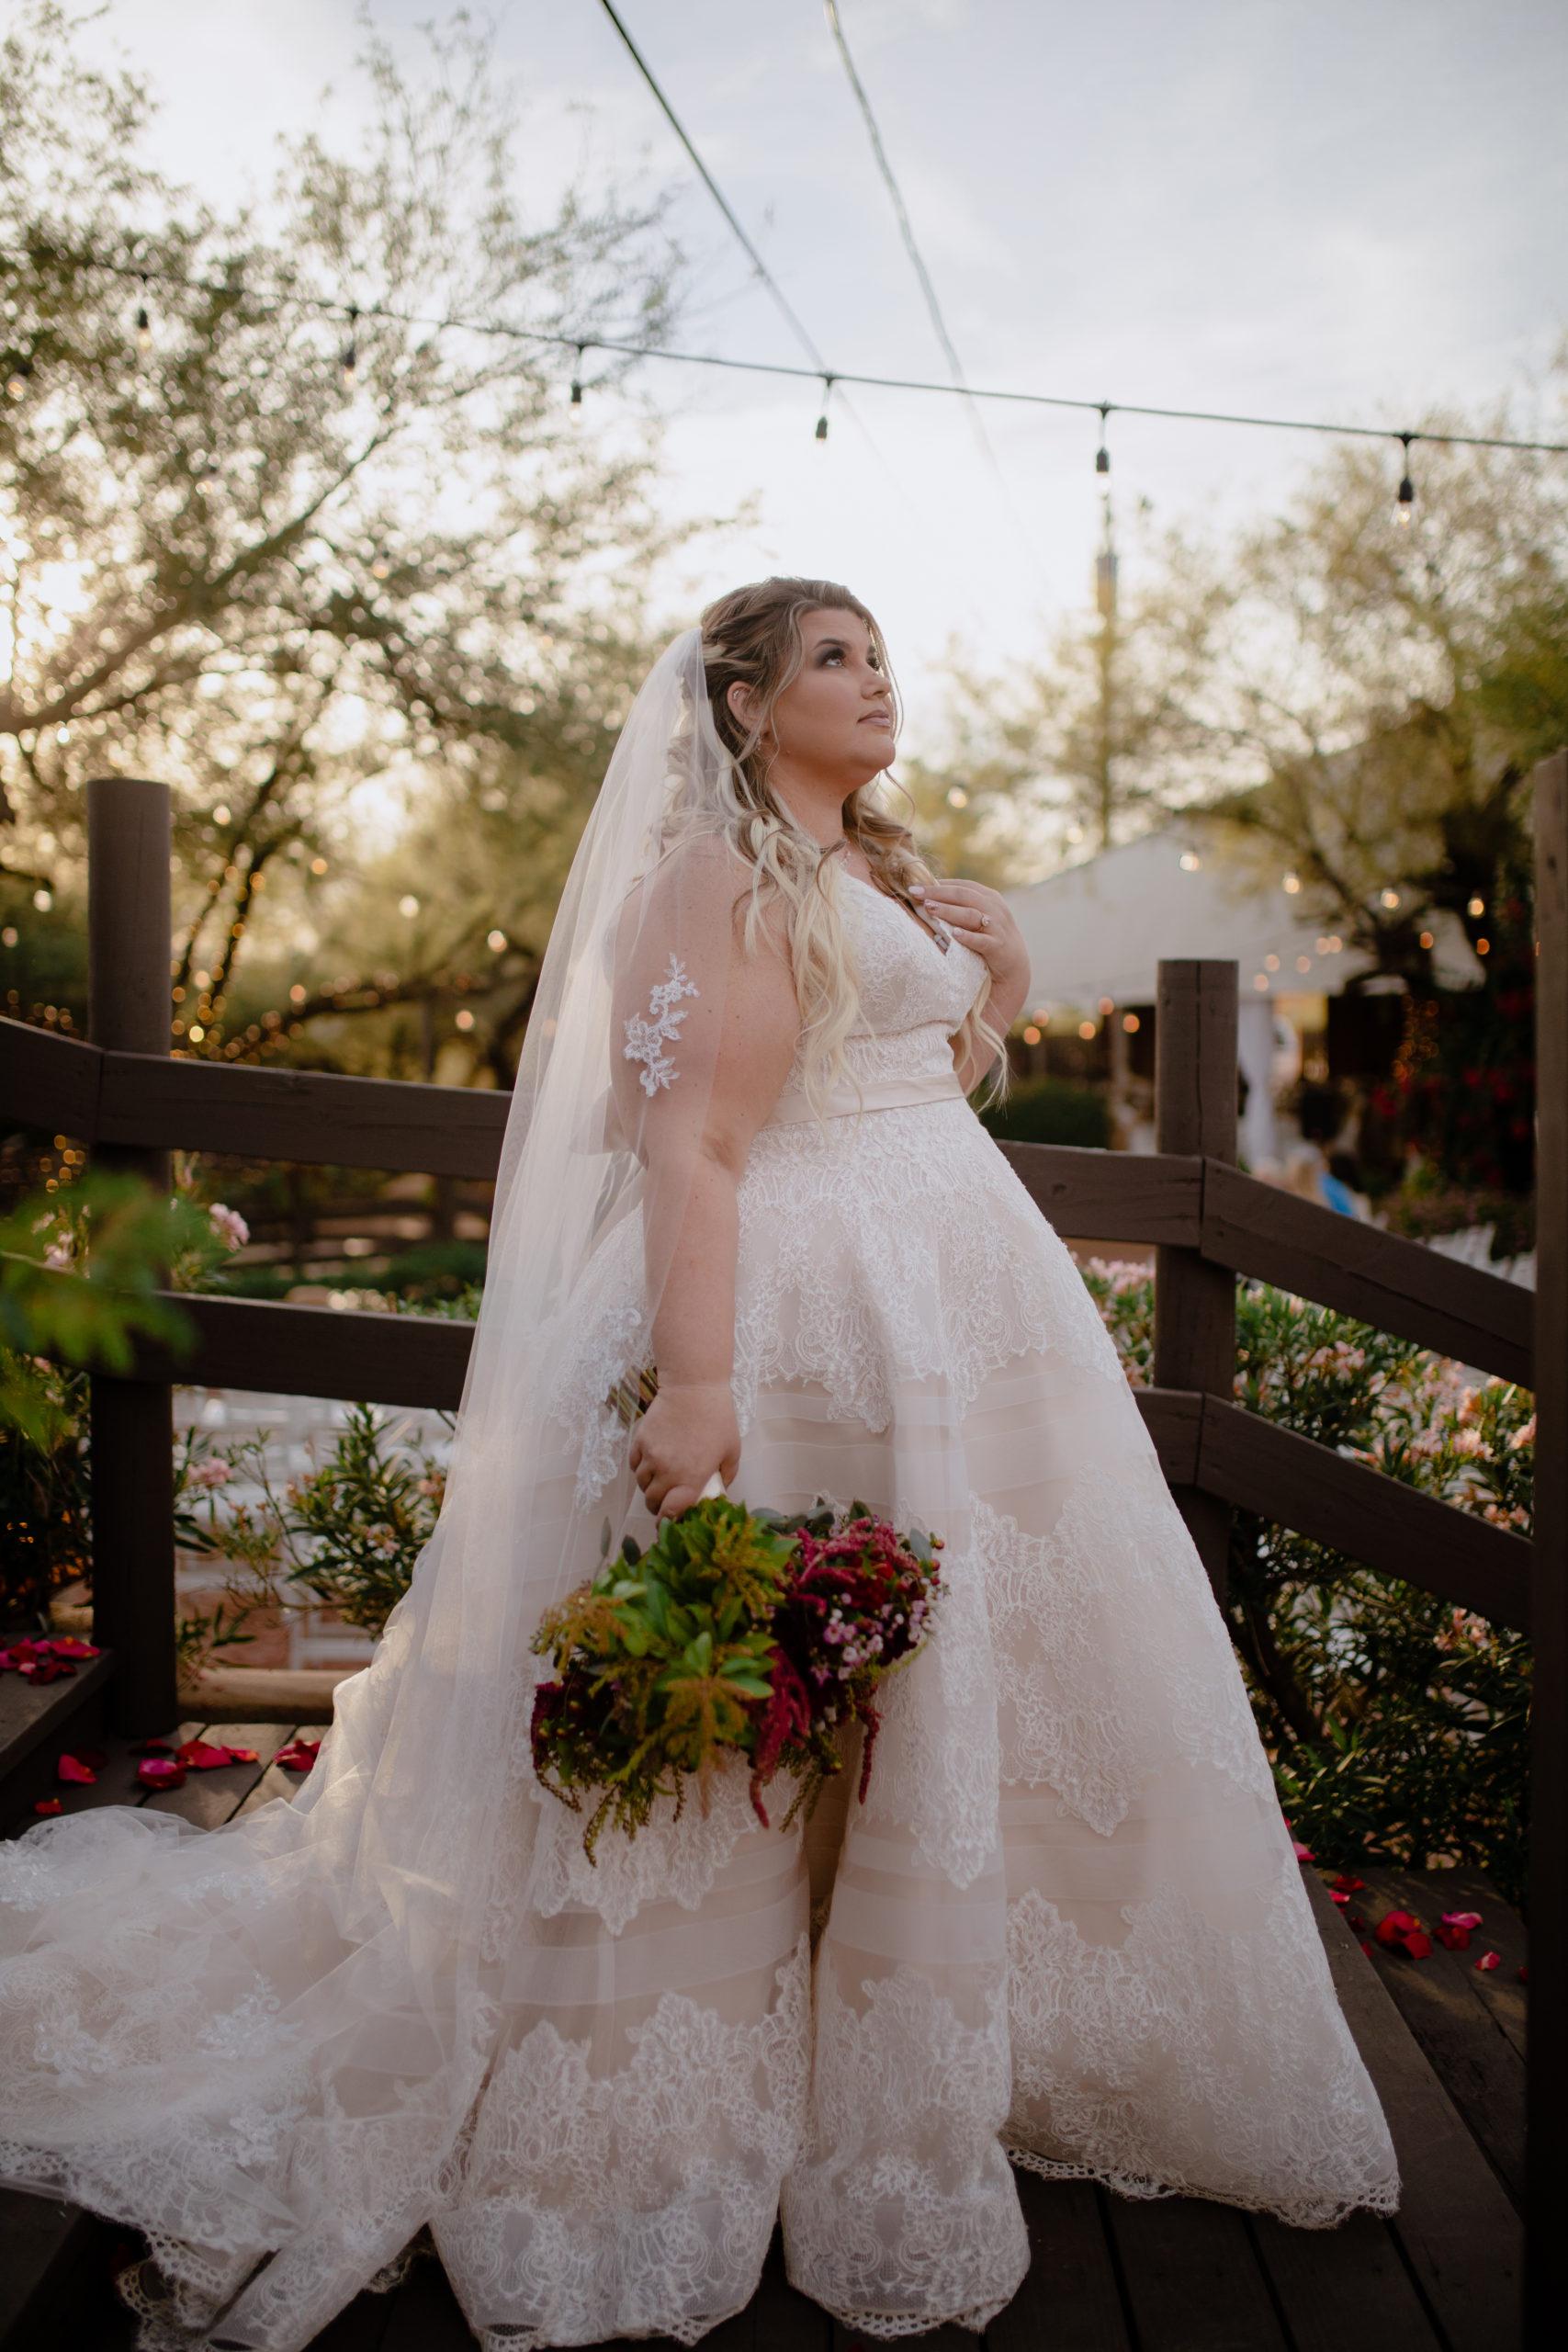 Kelly's Rustic Wedding in Cave Creek, Arizona